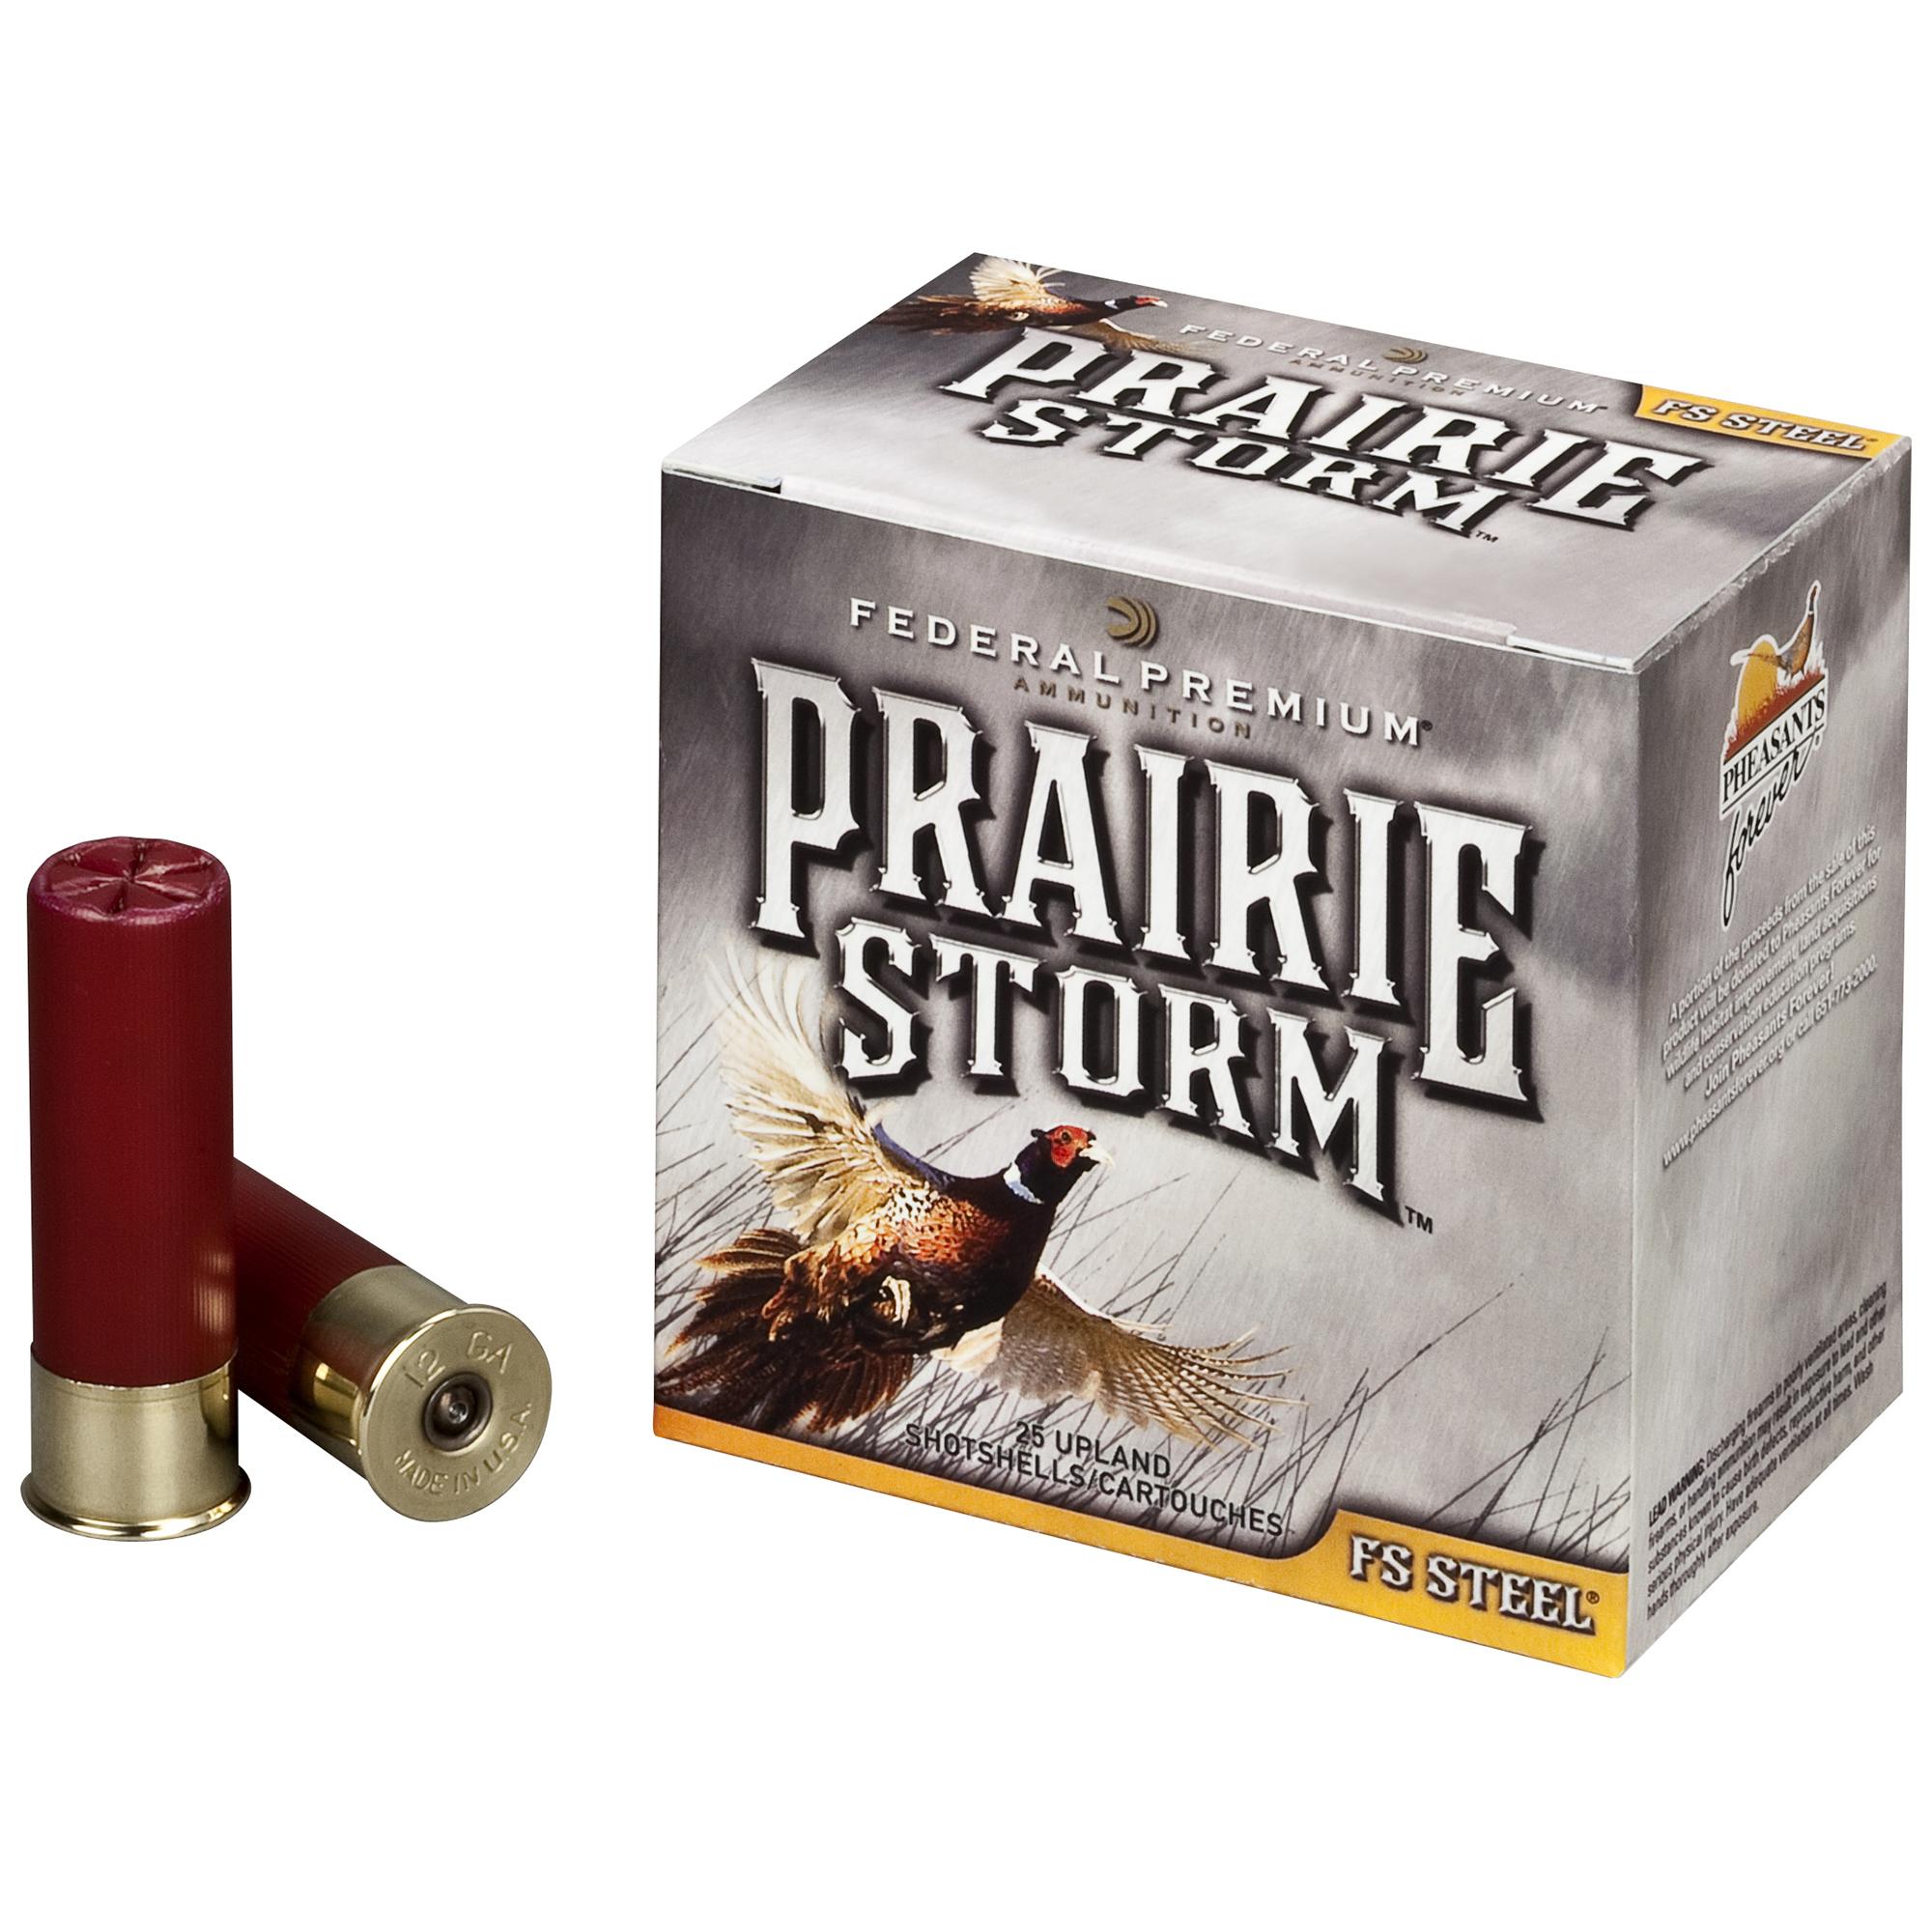 "Federal Premium Prairie Storm FS Steel Ammo, 20 Gauge, 3"", 7/8 oz., #4"